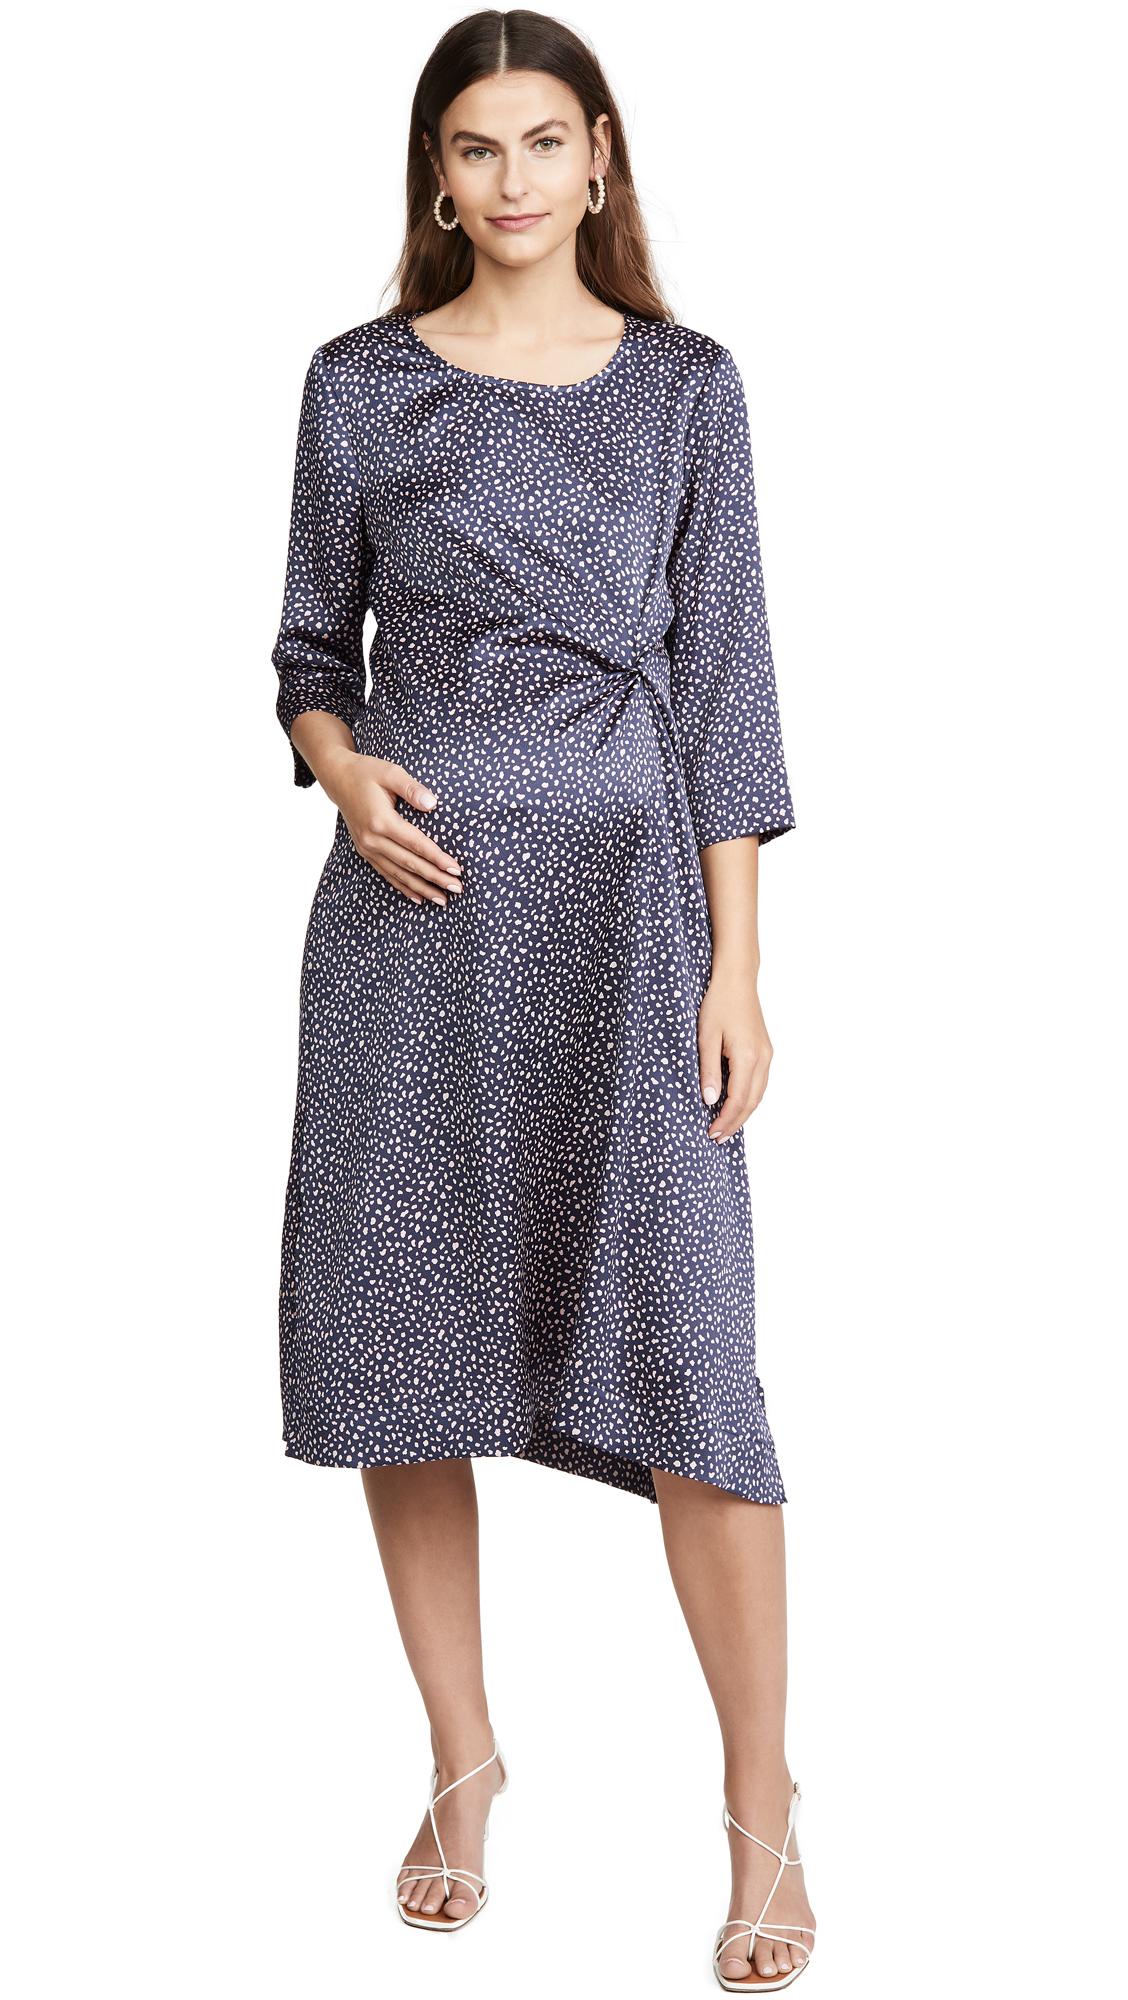 HATCH The Lauren Dress - 50% Off Sale